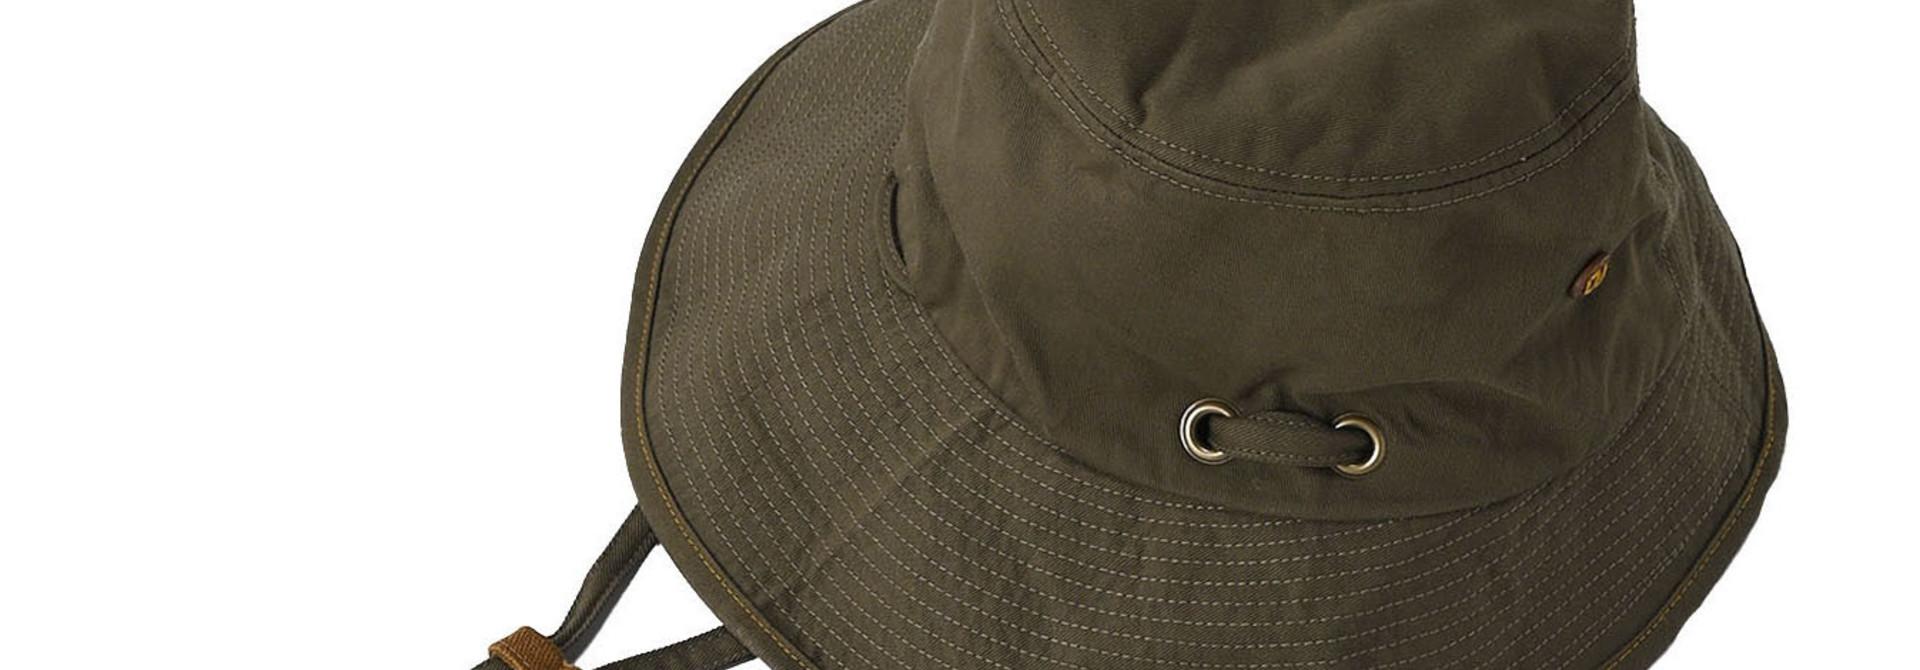 Okome Chino Sail Hat (0521)